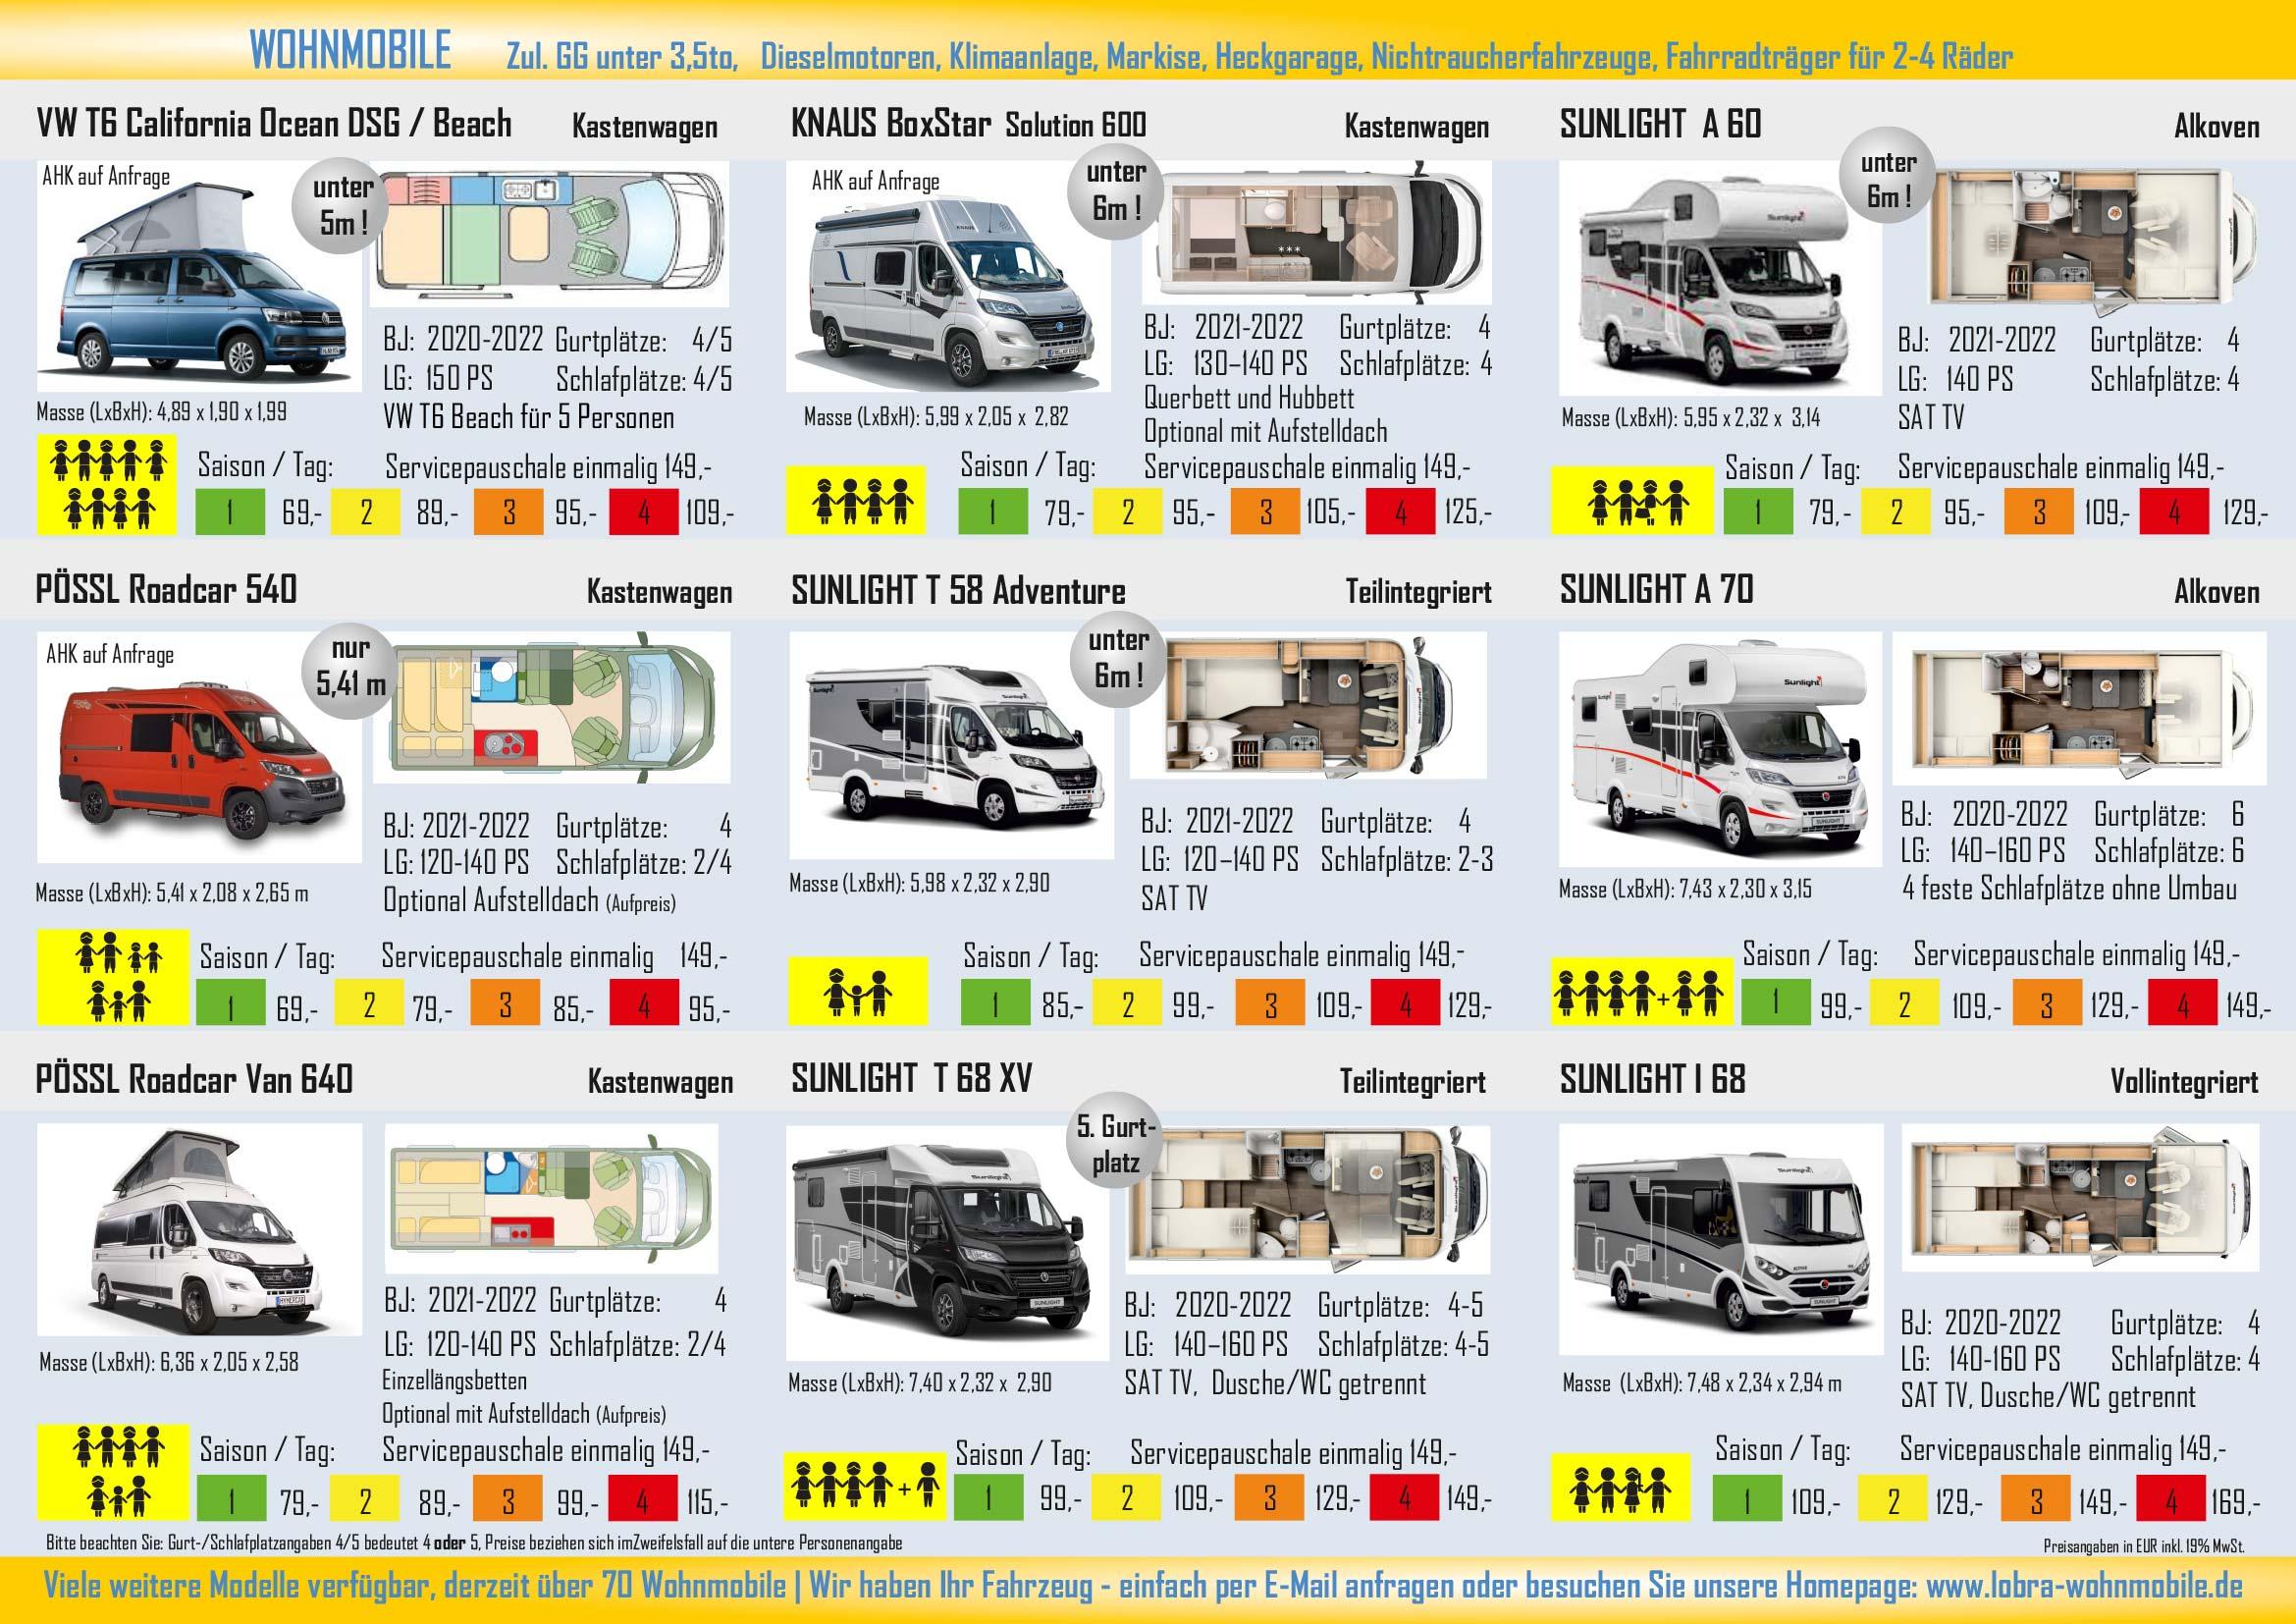 LOBRA Wohnmobile Preisliste 2022